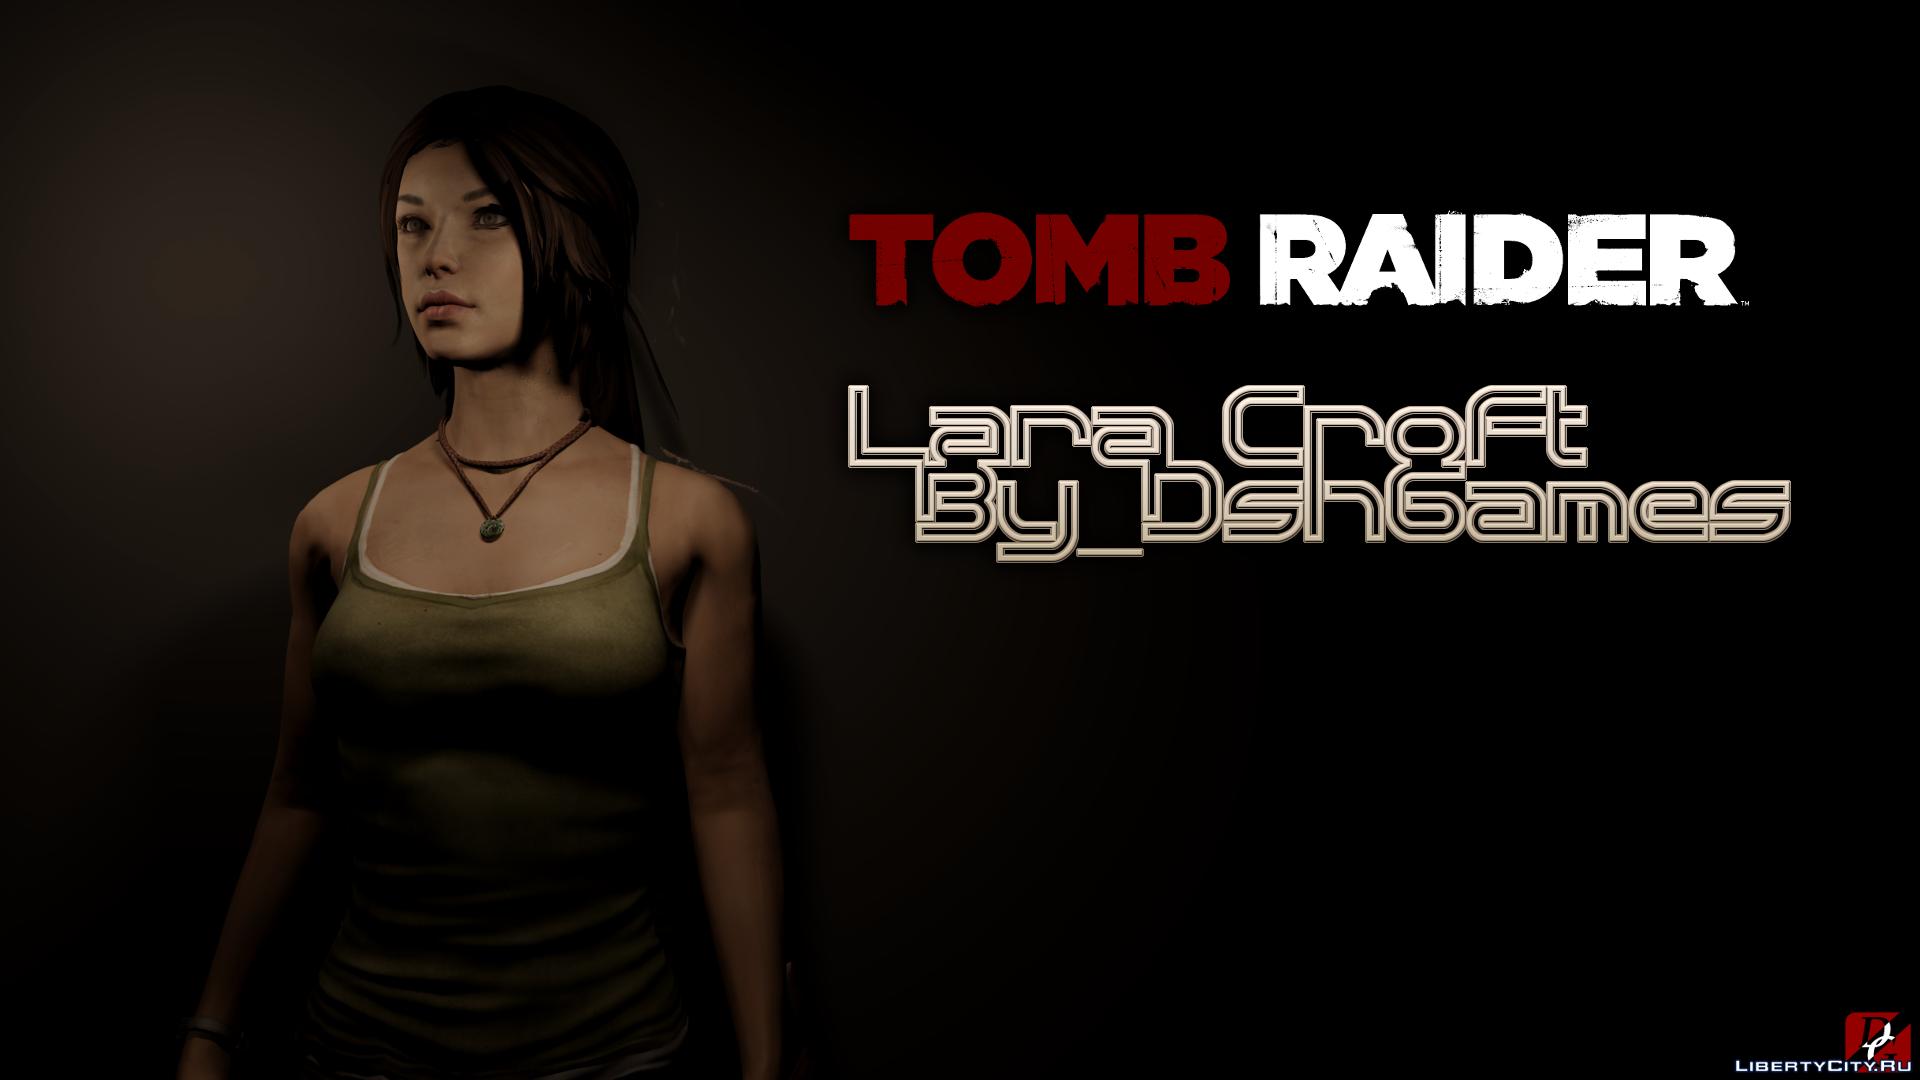 TOMB RAIDER: Lara Croft 0